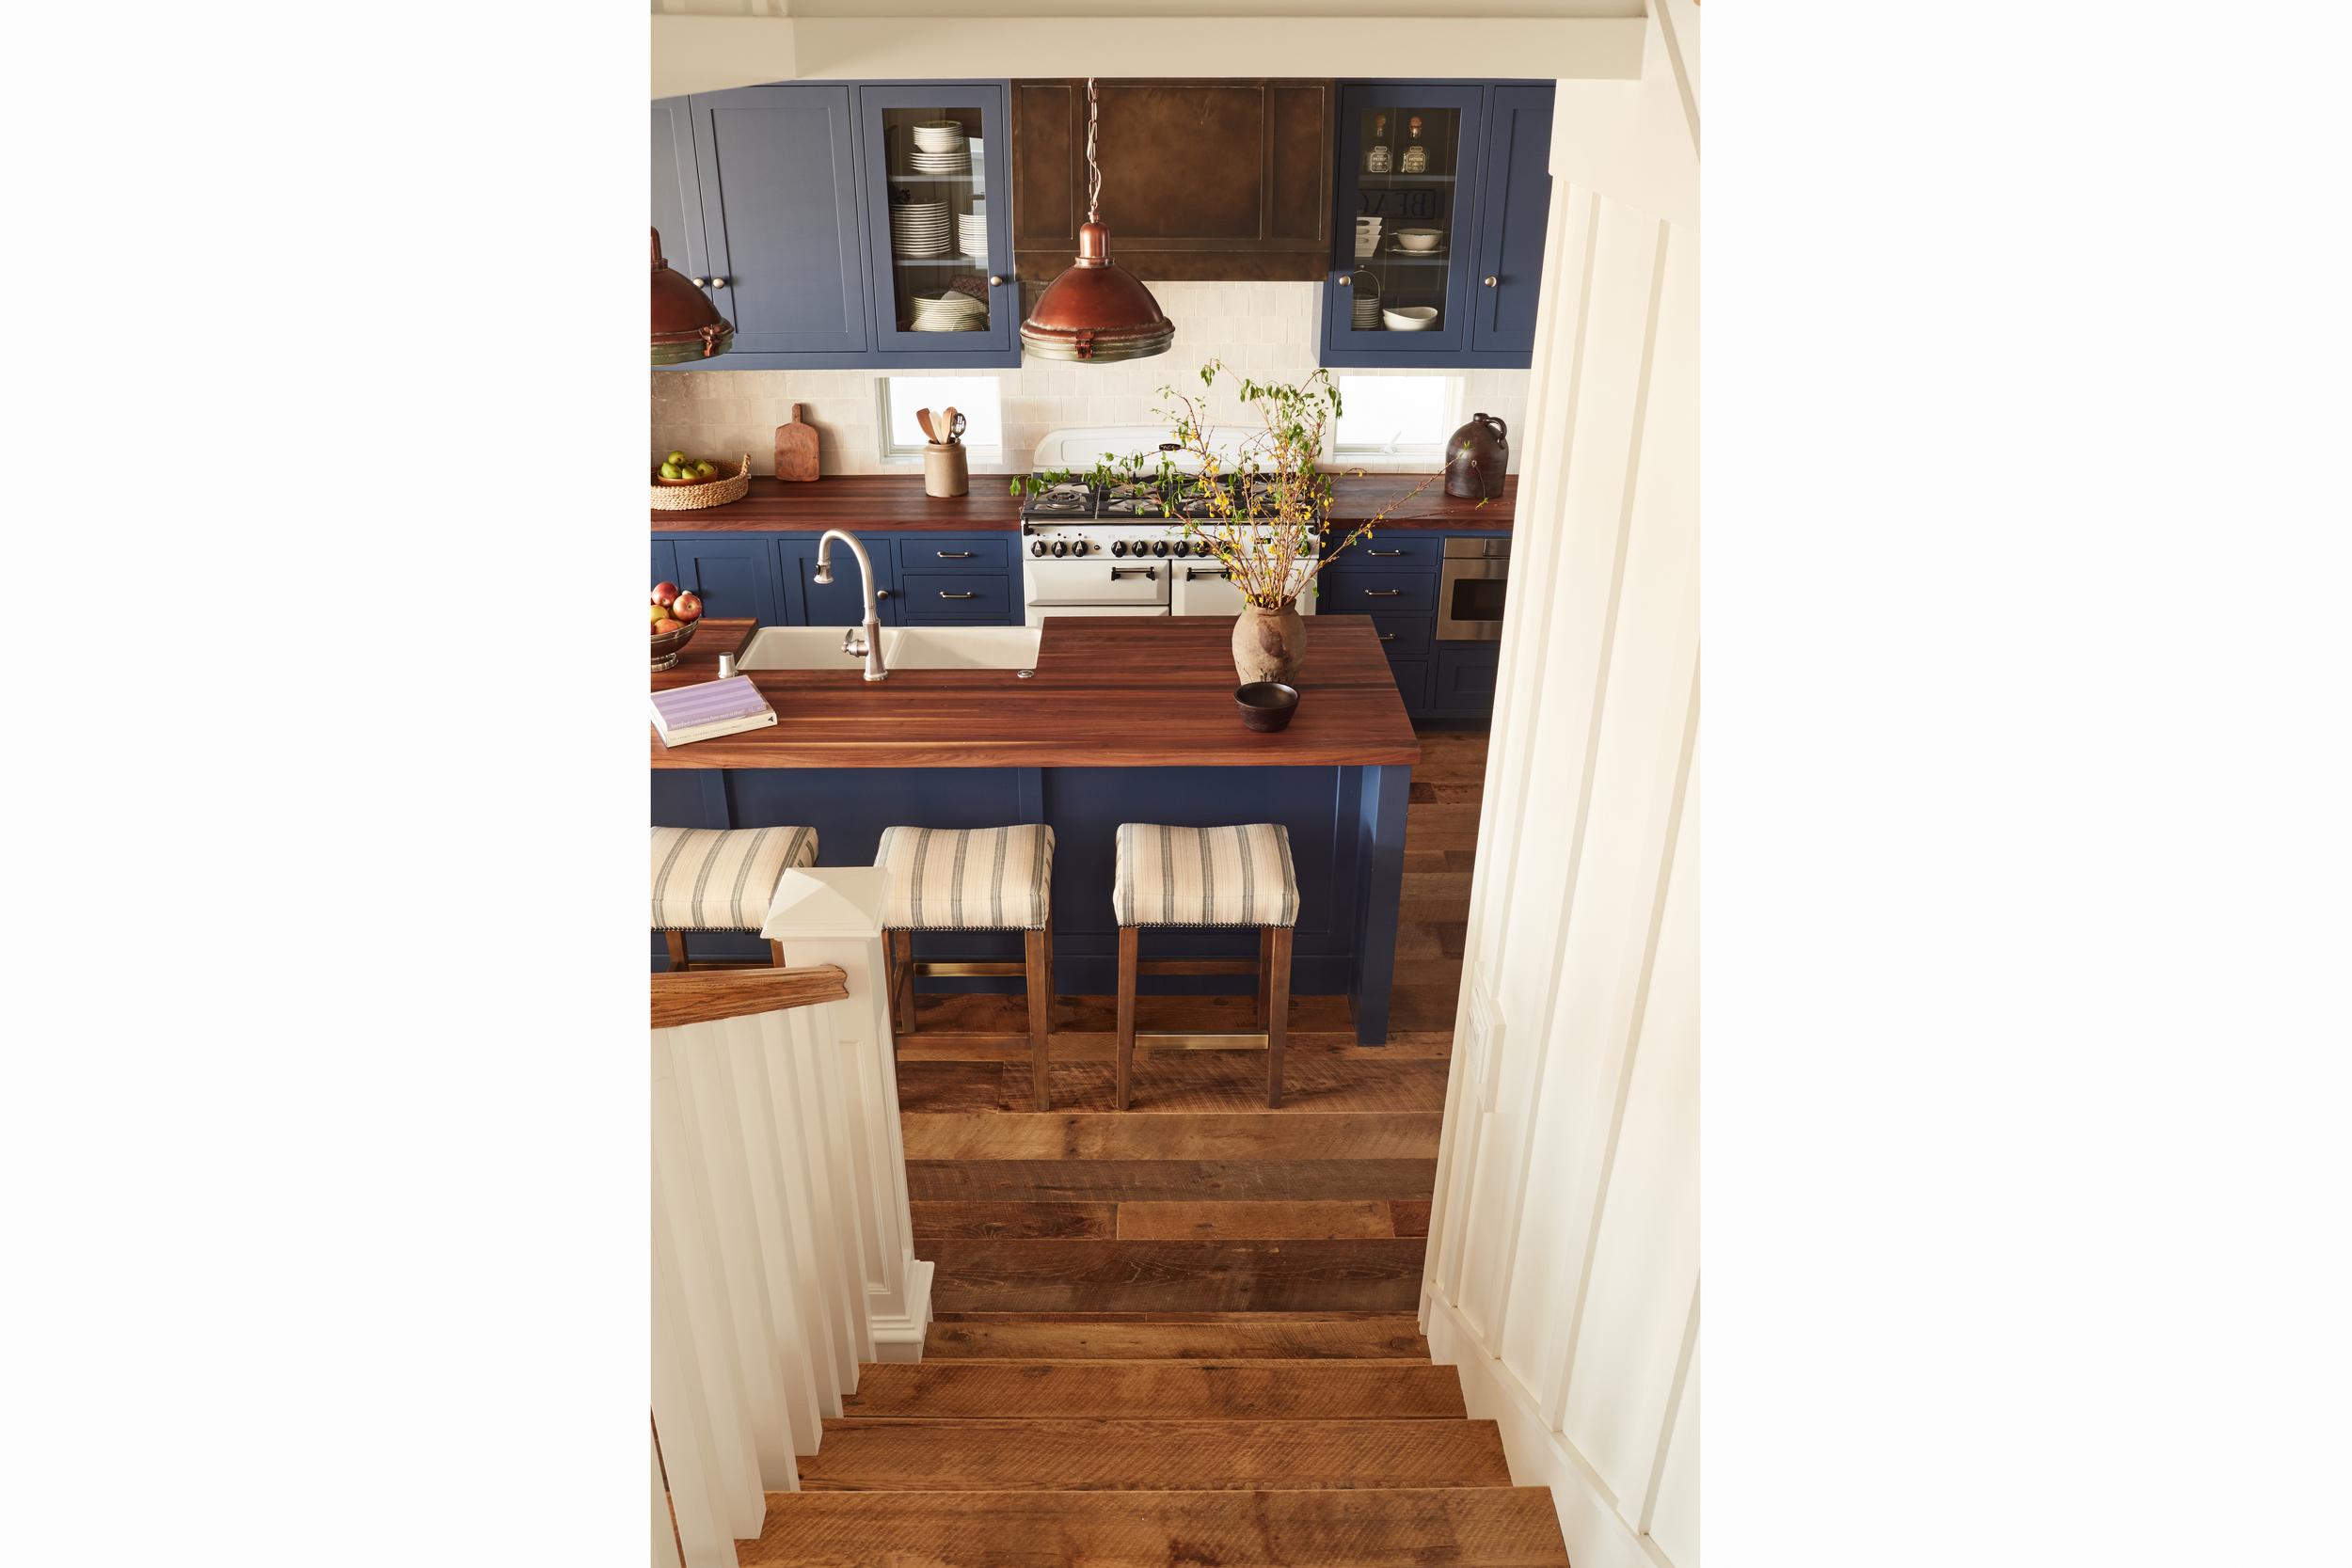 newport beach interior designer brittany stiles blue nautical stairs and kitchen board and batten.jpg